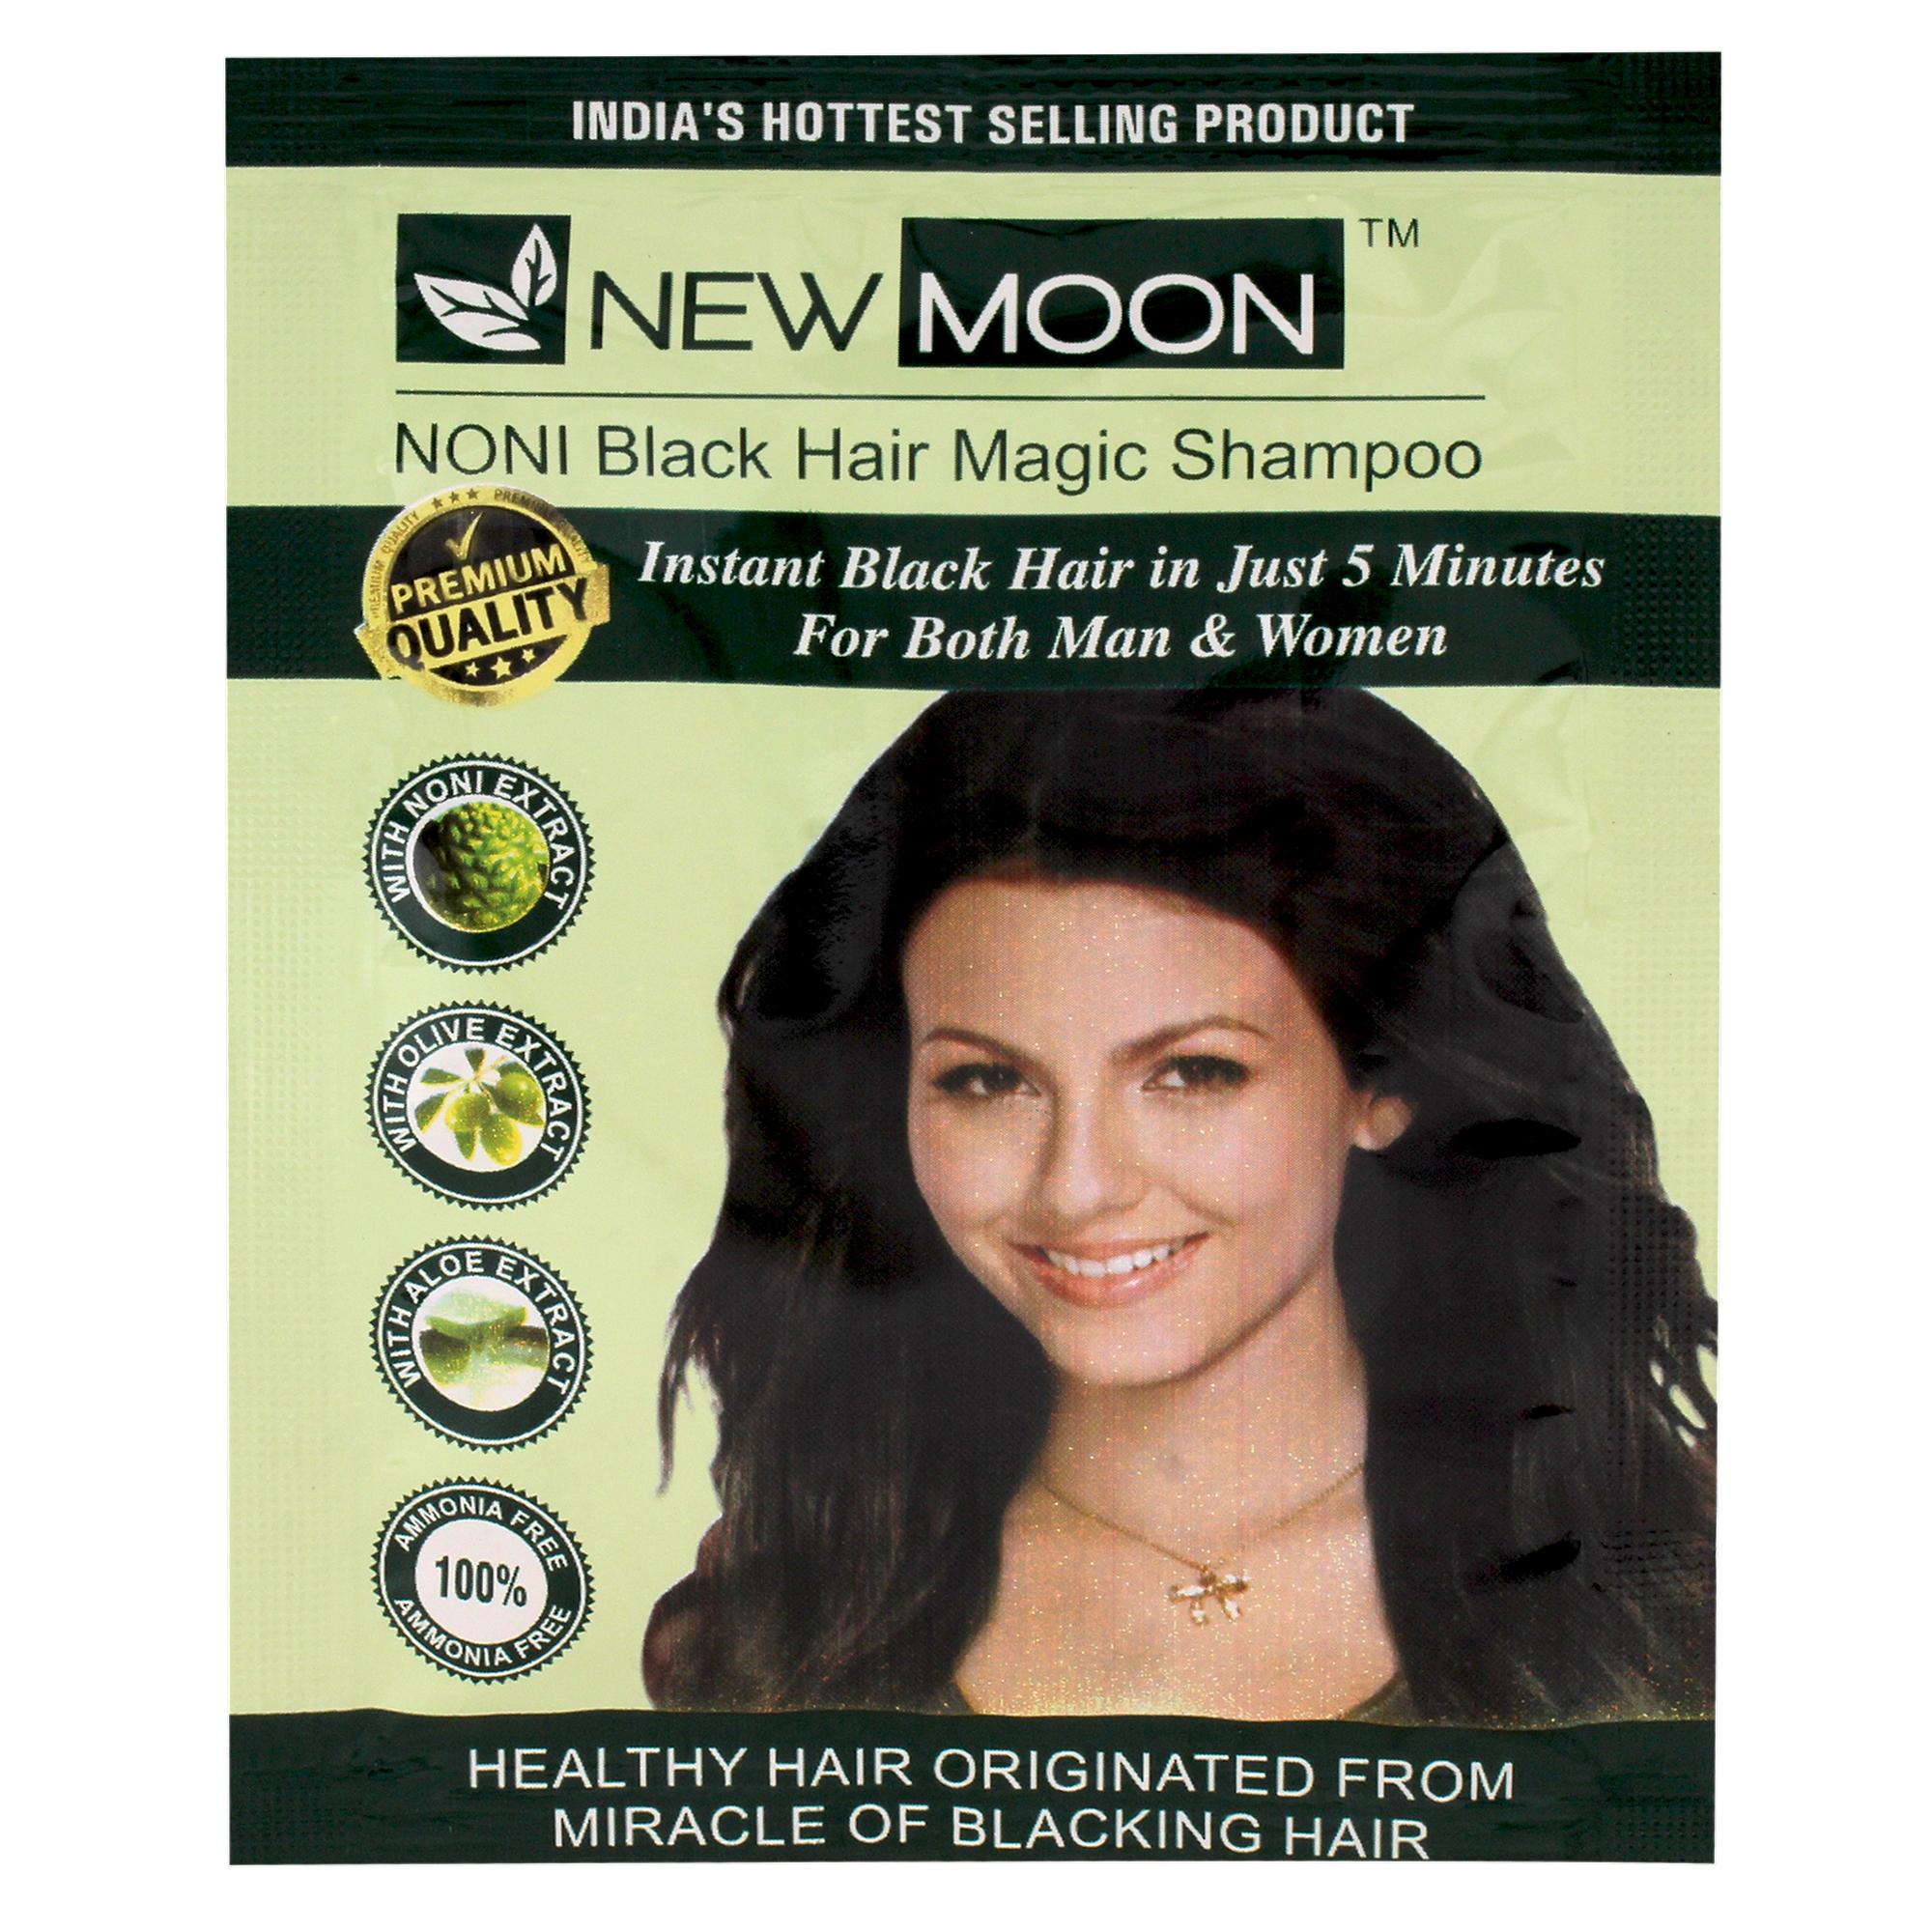 New Moon Noni Black Hair Shampoo